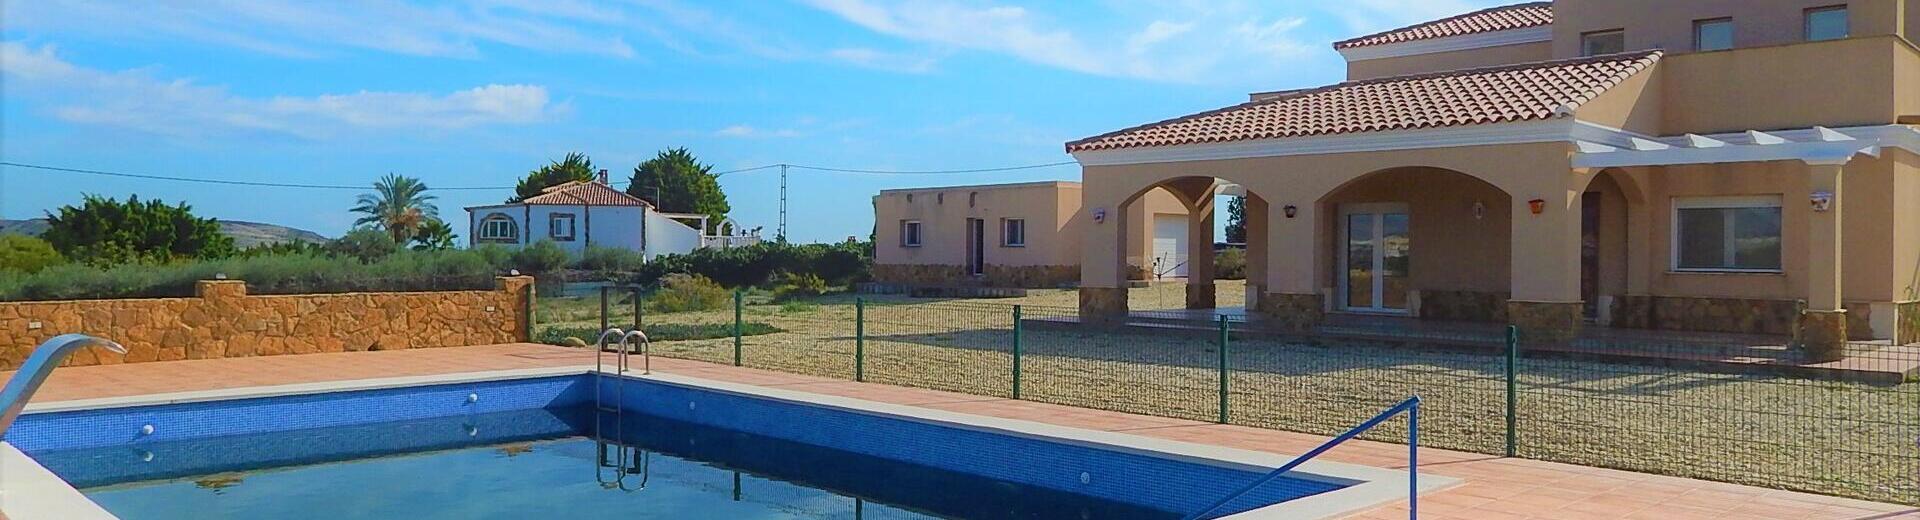 VIP7658: Villa à vendre